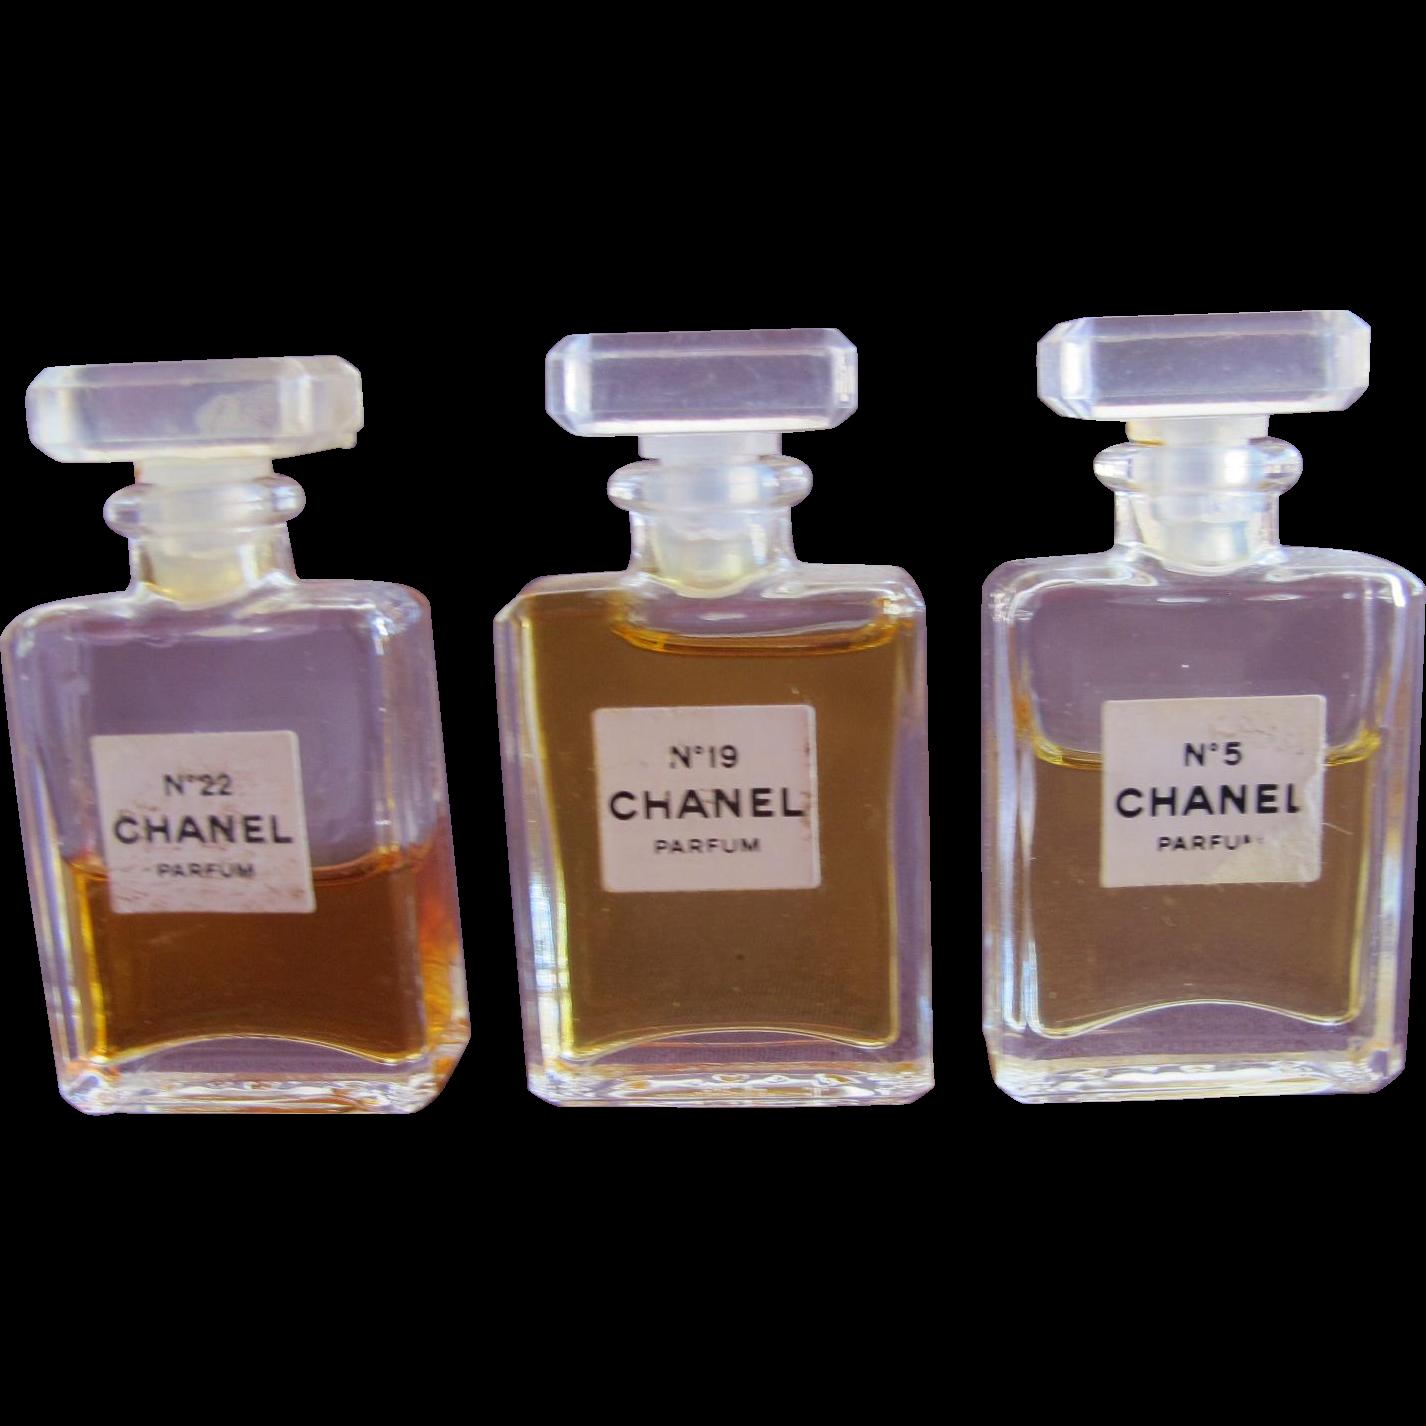 Chanel Perfume Bottles No 5 No 19 and No 22 Mini Perfume ...